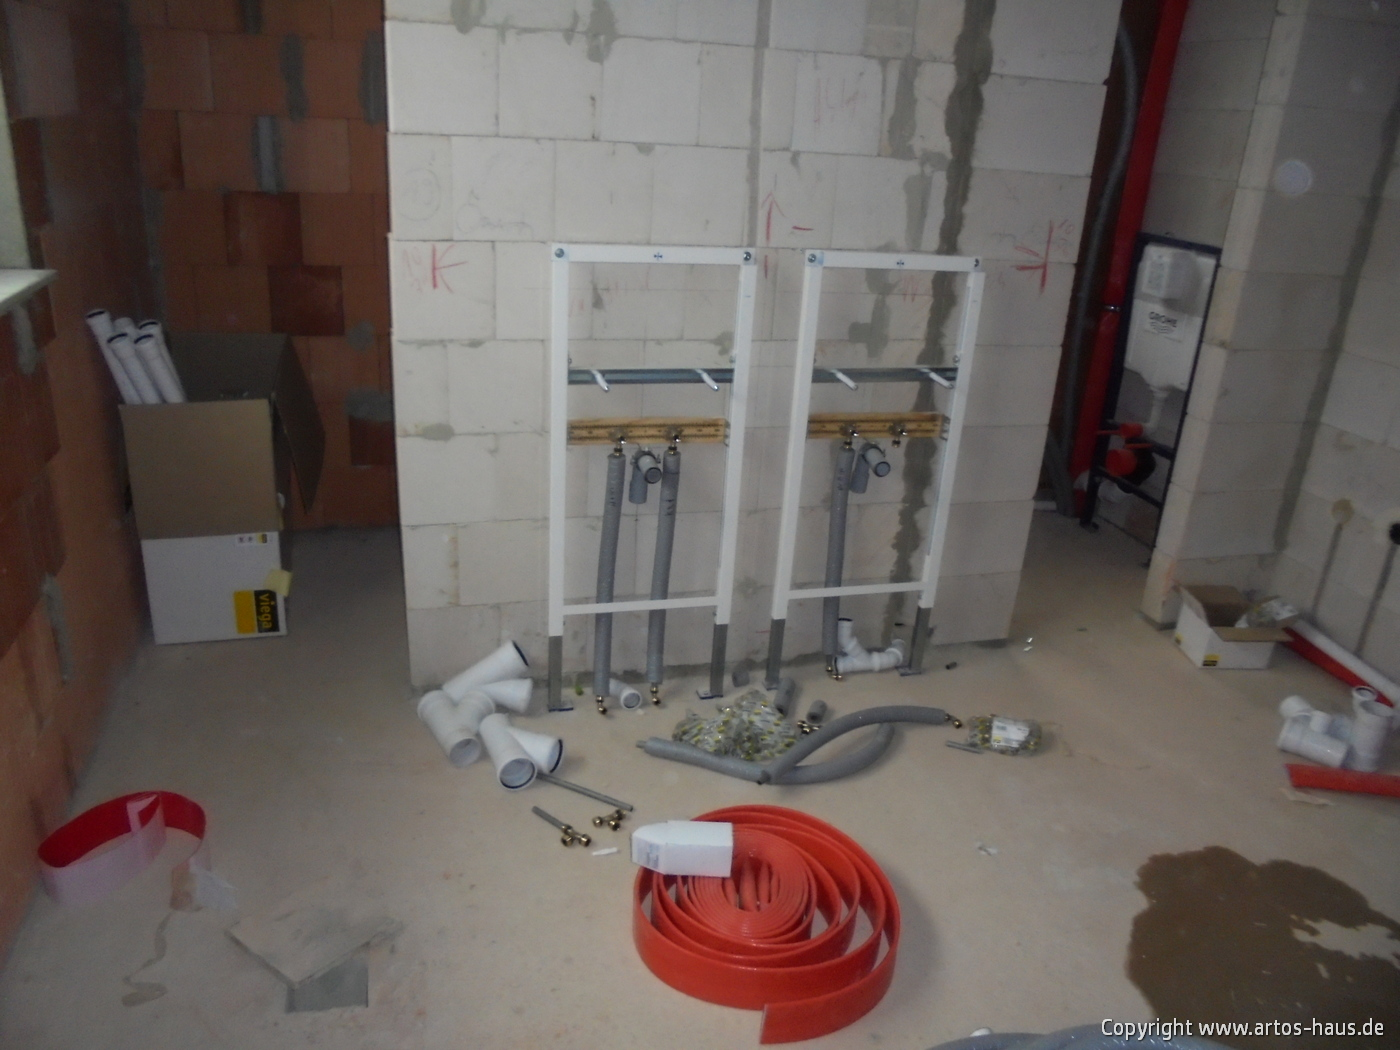 Rohinstallation Sanitär | ARTOS-HAUS Bauvorhaben in Bonn